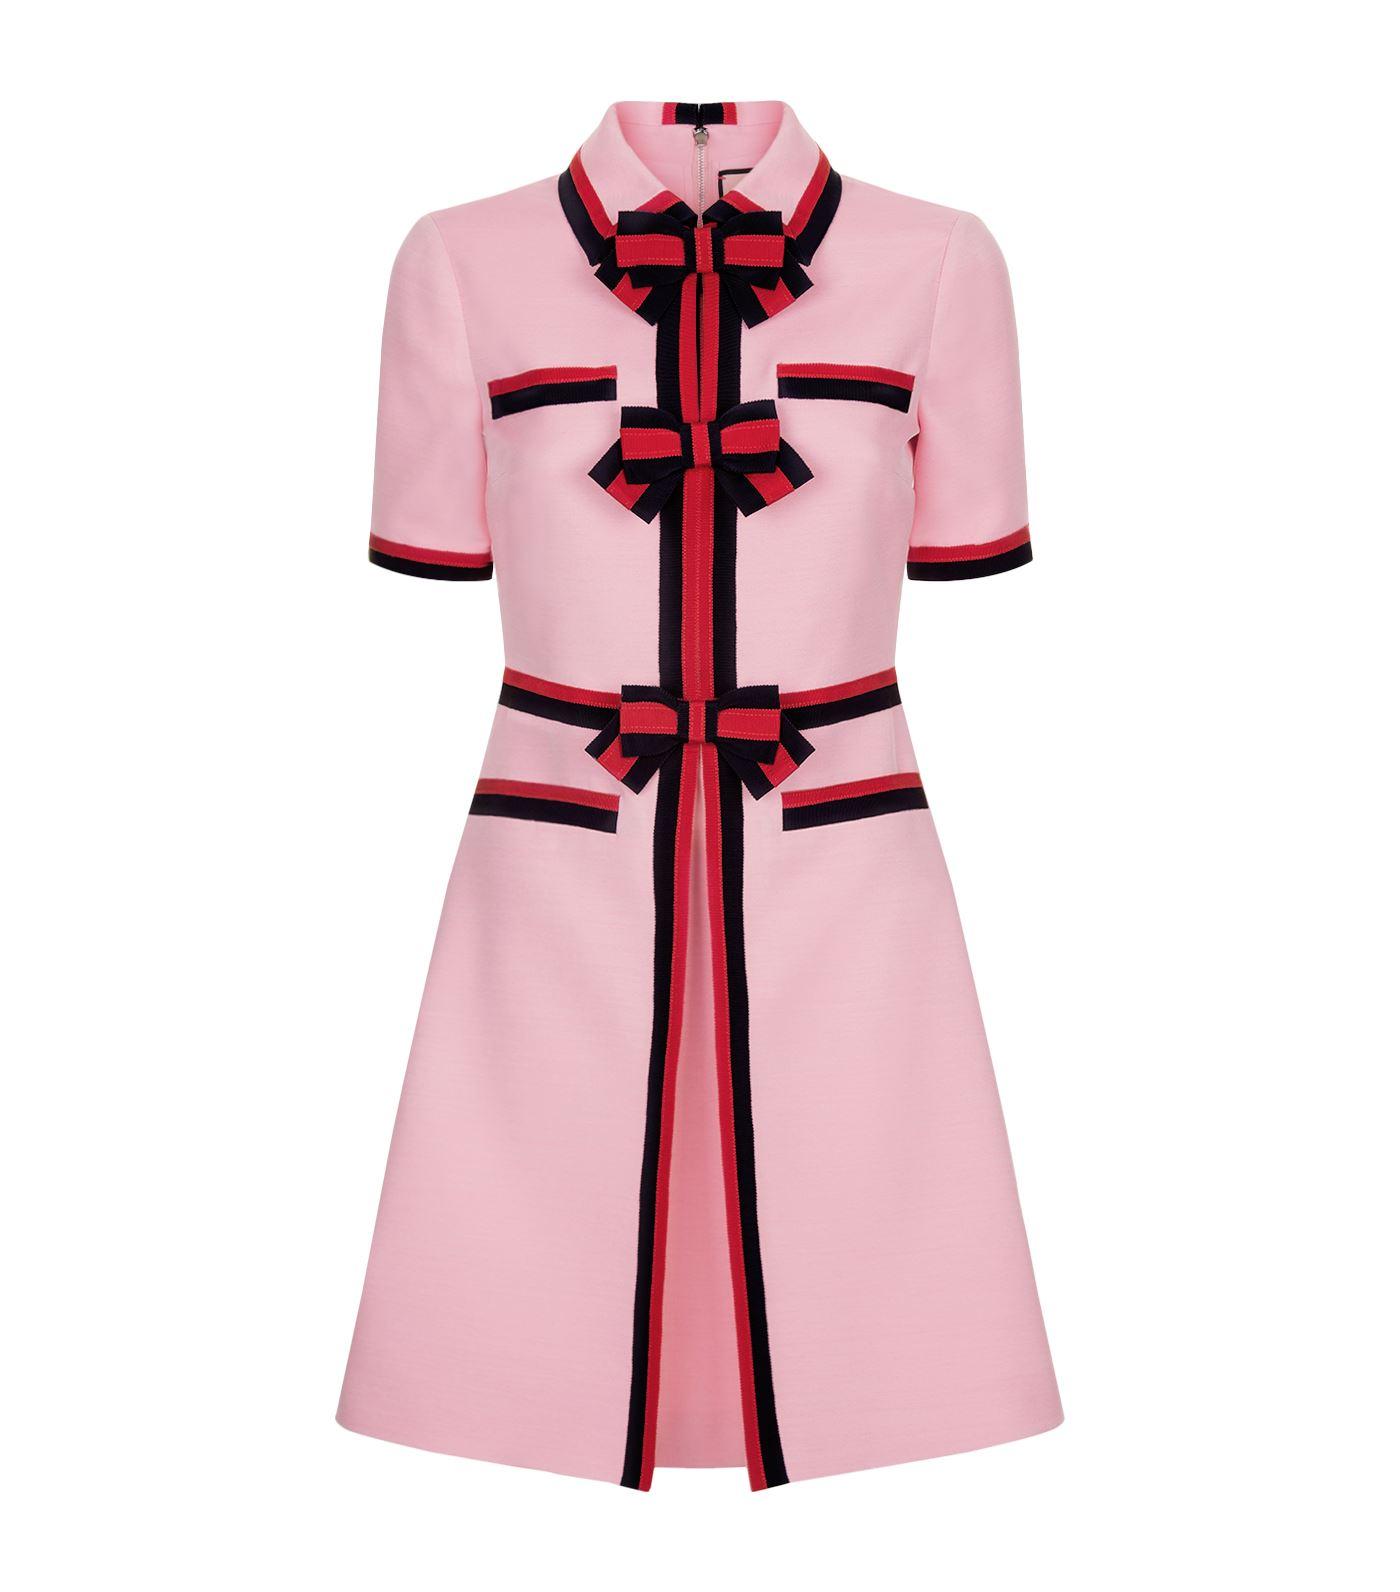 web-stripe-bow-dress_000000005863405001.jpg